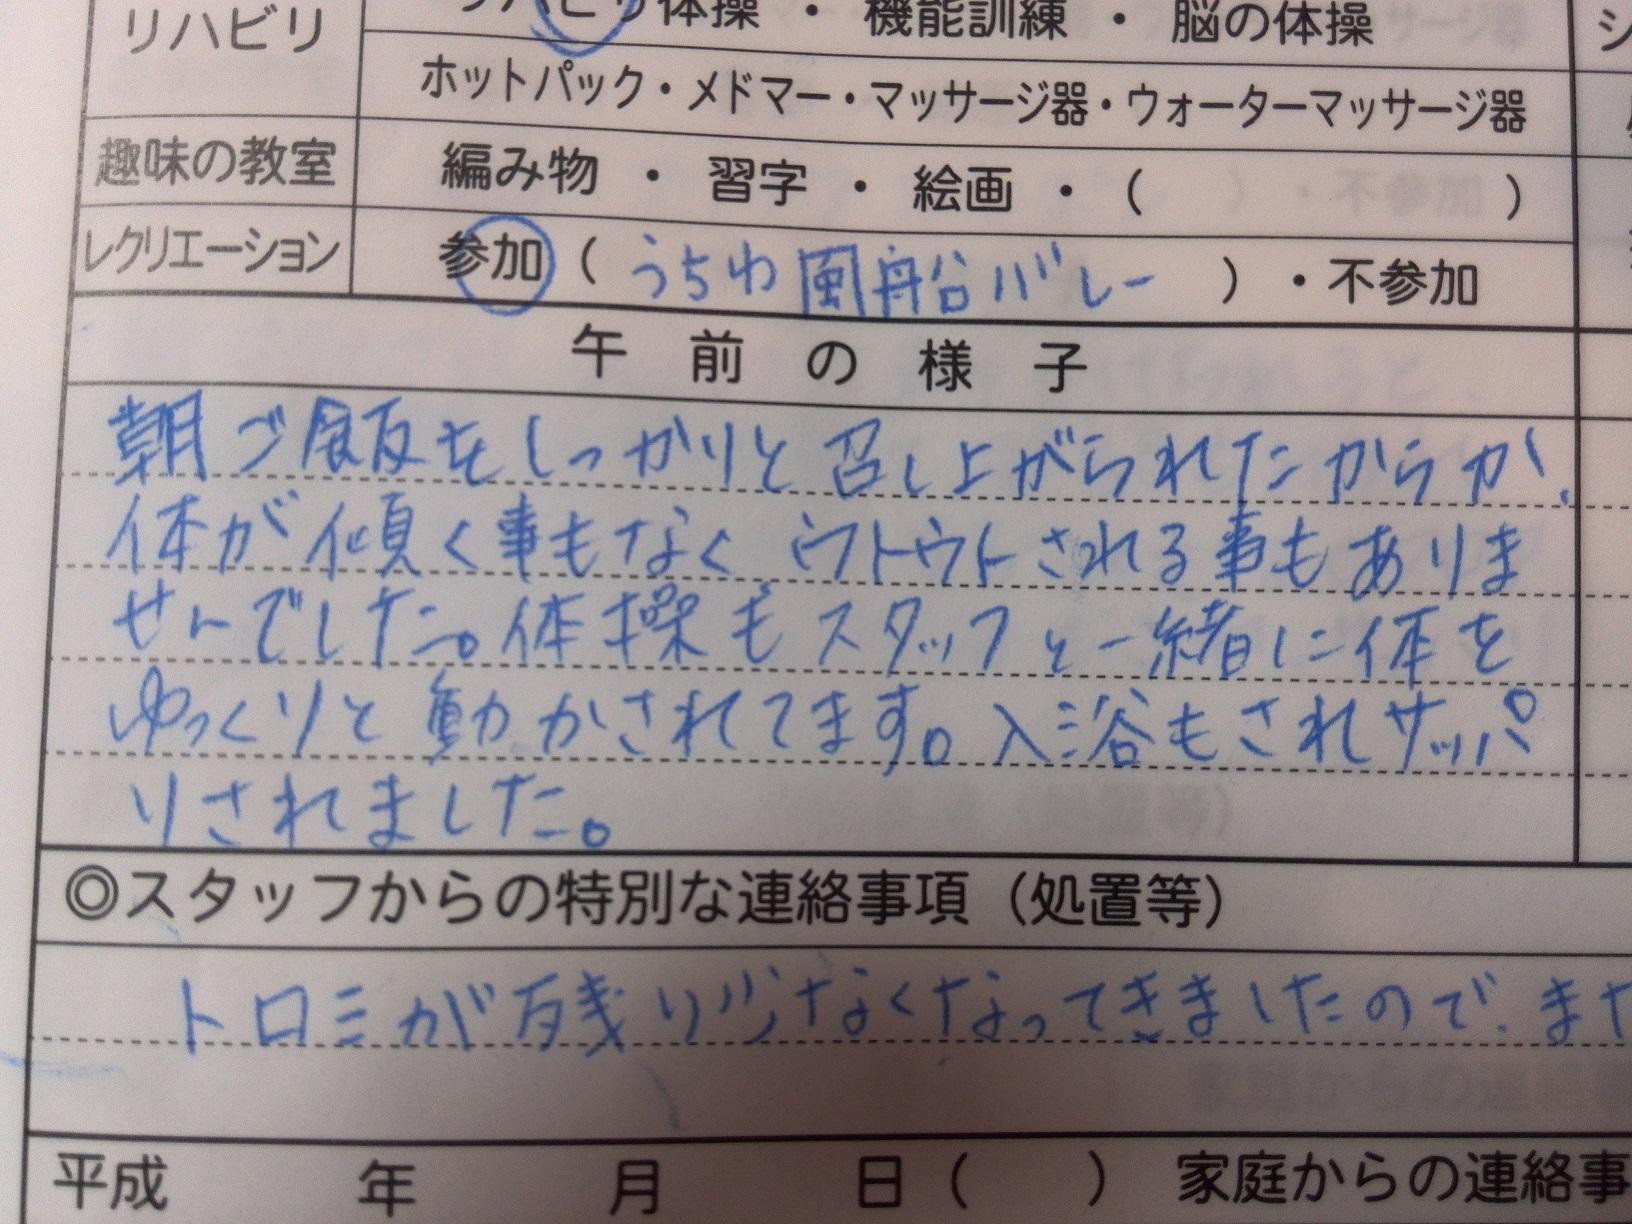 2014-06-07-00-07-40_photo1.jpg